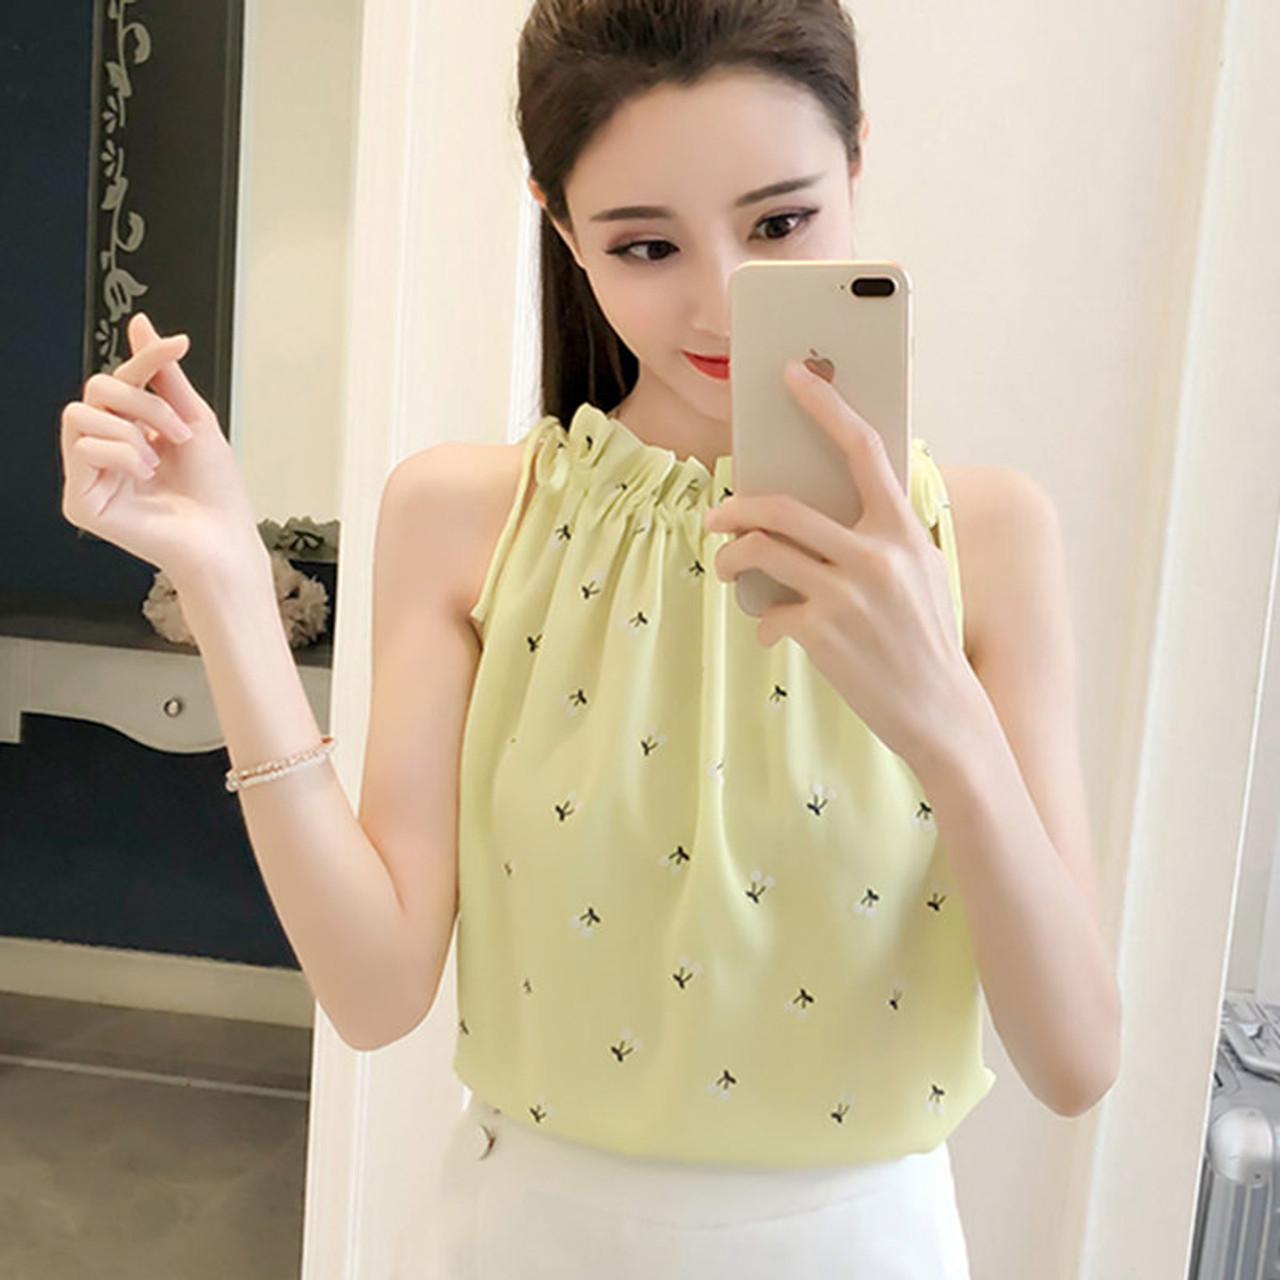 Women Blouses 2018 Fashion Elegant Print Chiffon Blouse Sleeveless Shirts  Casual summer Top Ladies Clothing Blusa Feminina